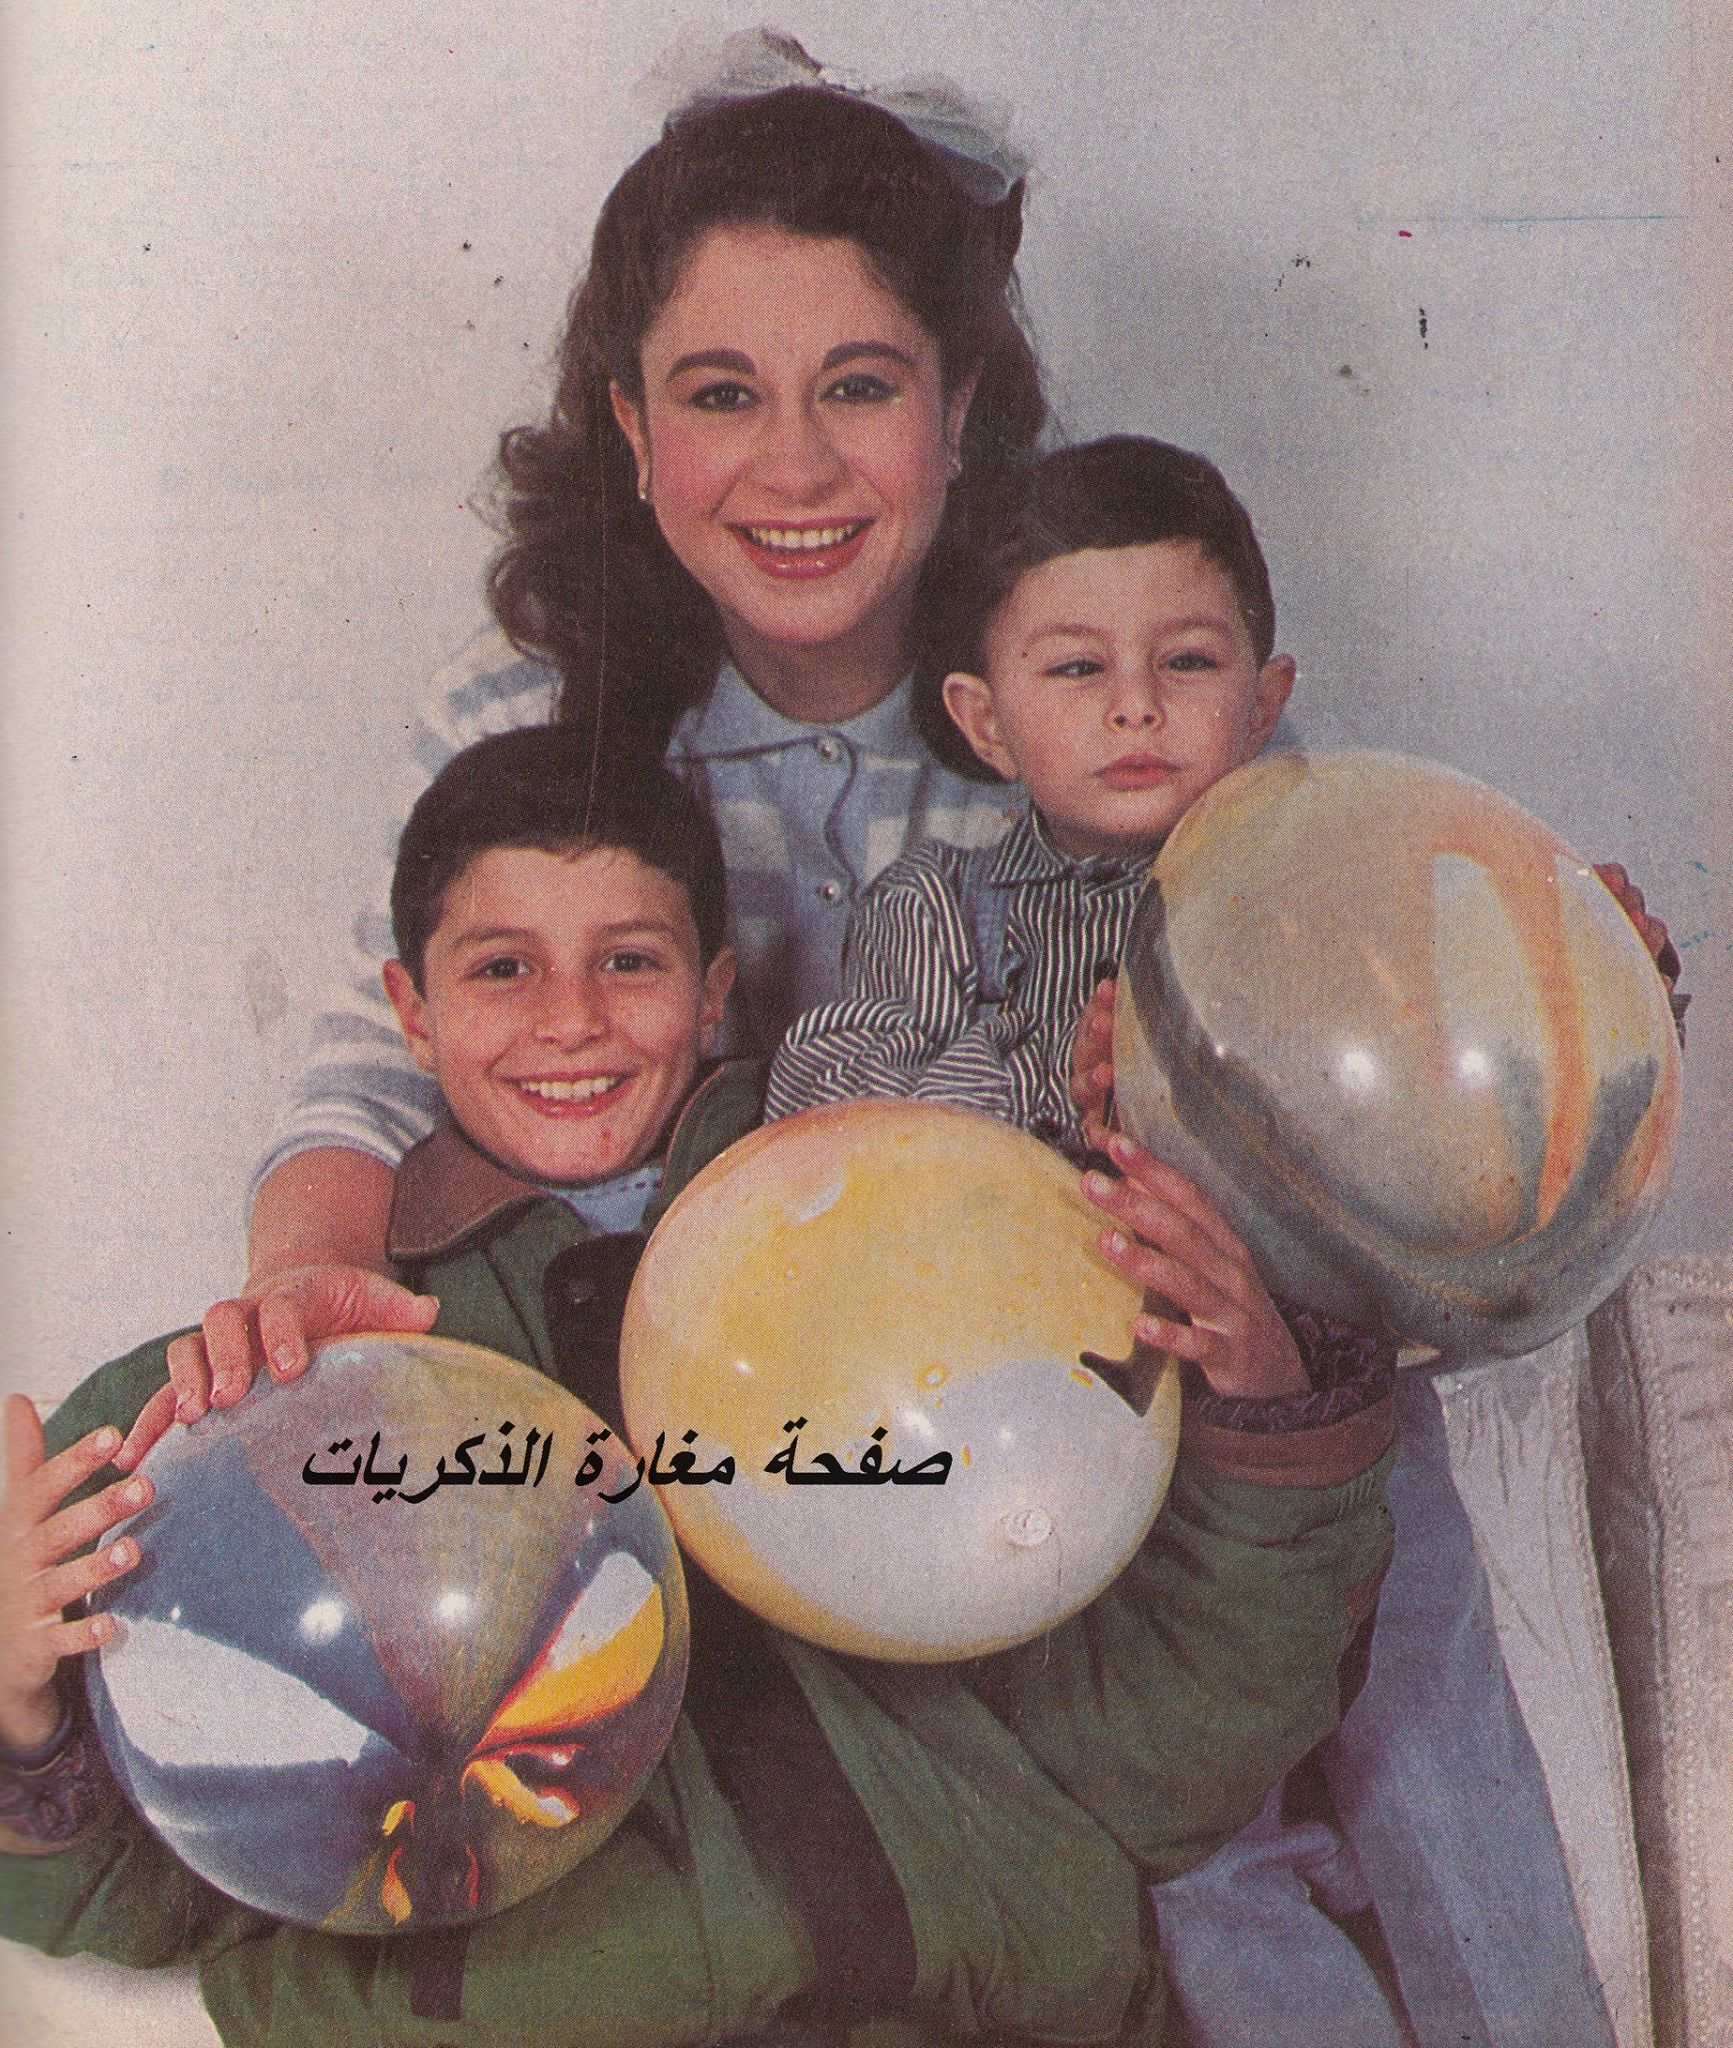 سمية الالفى وابنائها احمد وعمر Egypt History Movie Stars Egyptian